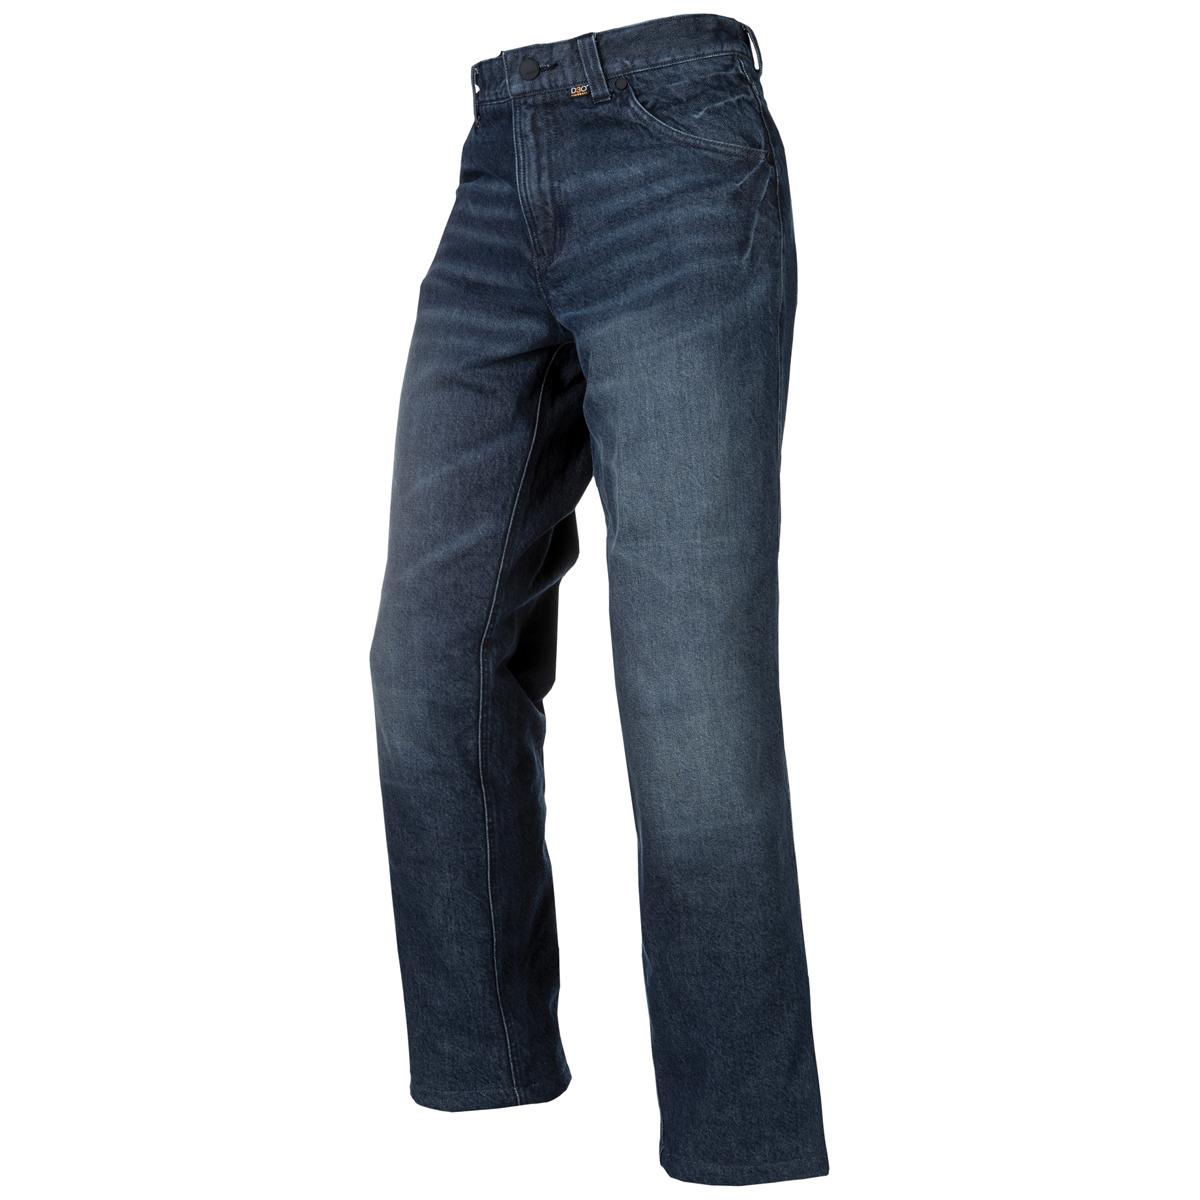 Klim Men's K Fifty 2 Dark Blue Riding Jeans